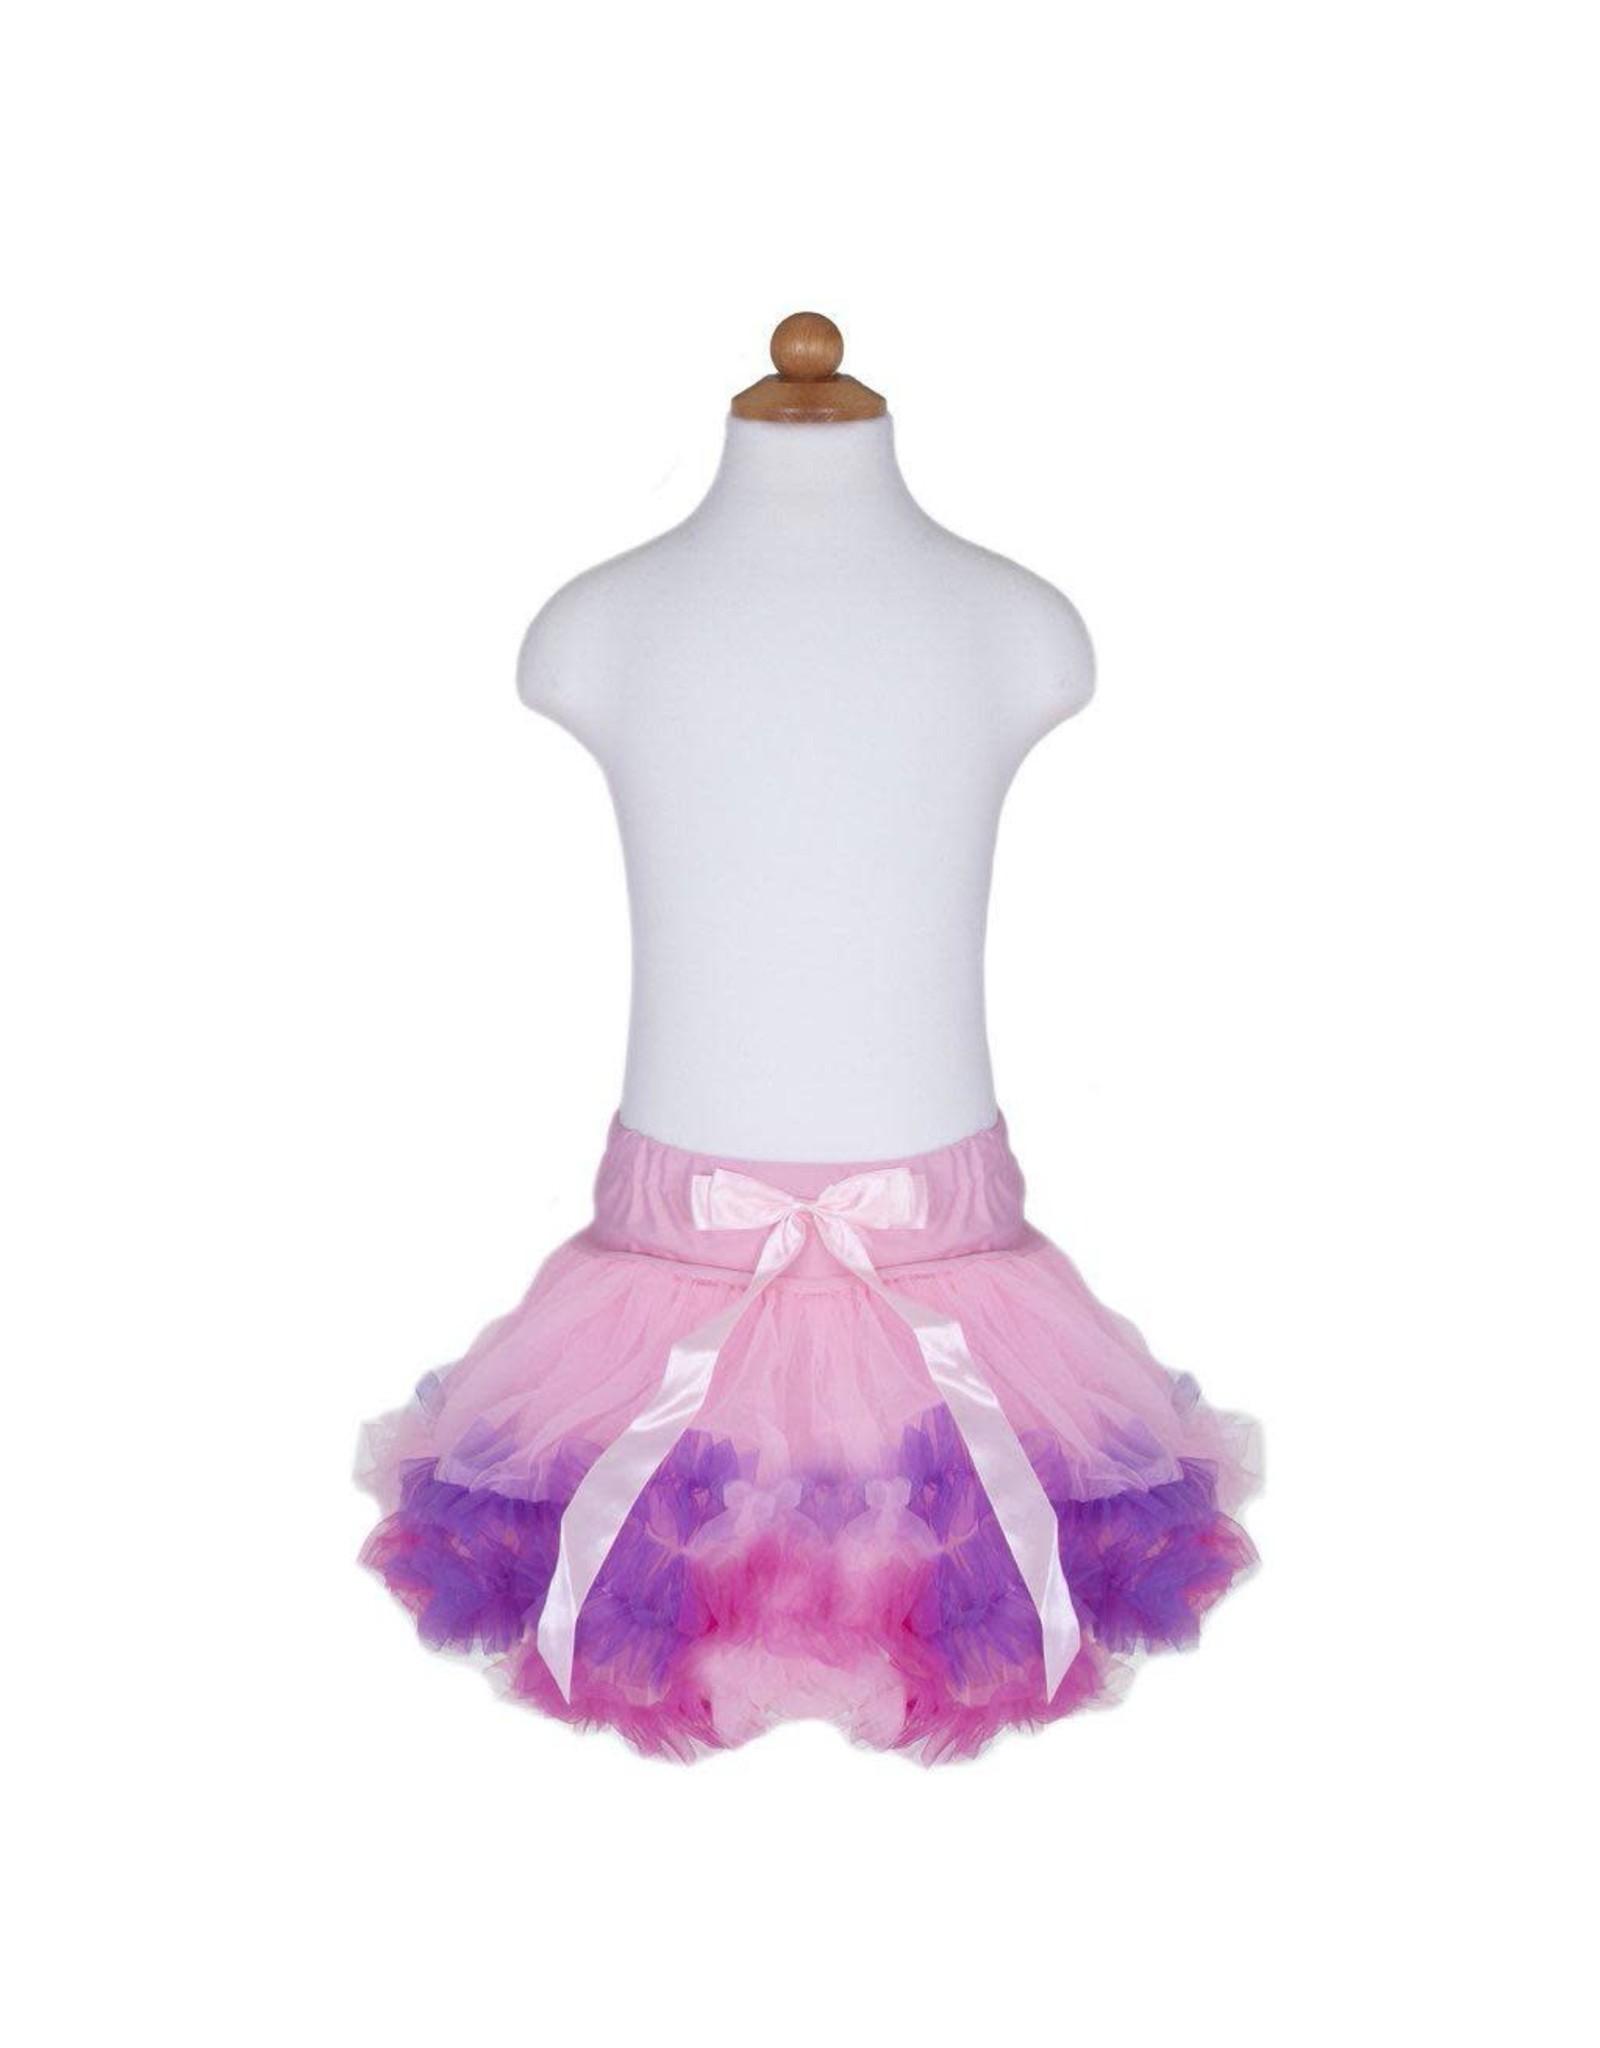 Great Pretenders Petticoat Skirt Light Pink, Size 4-7